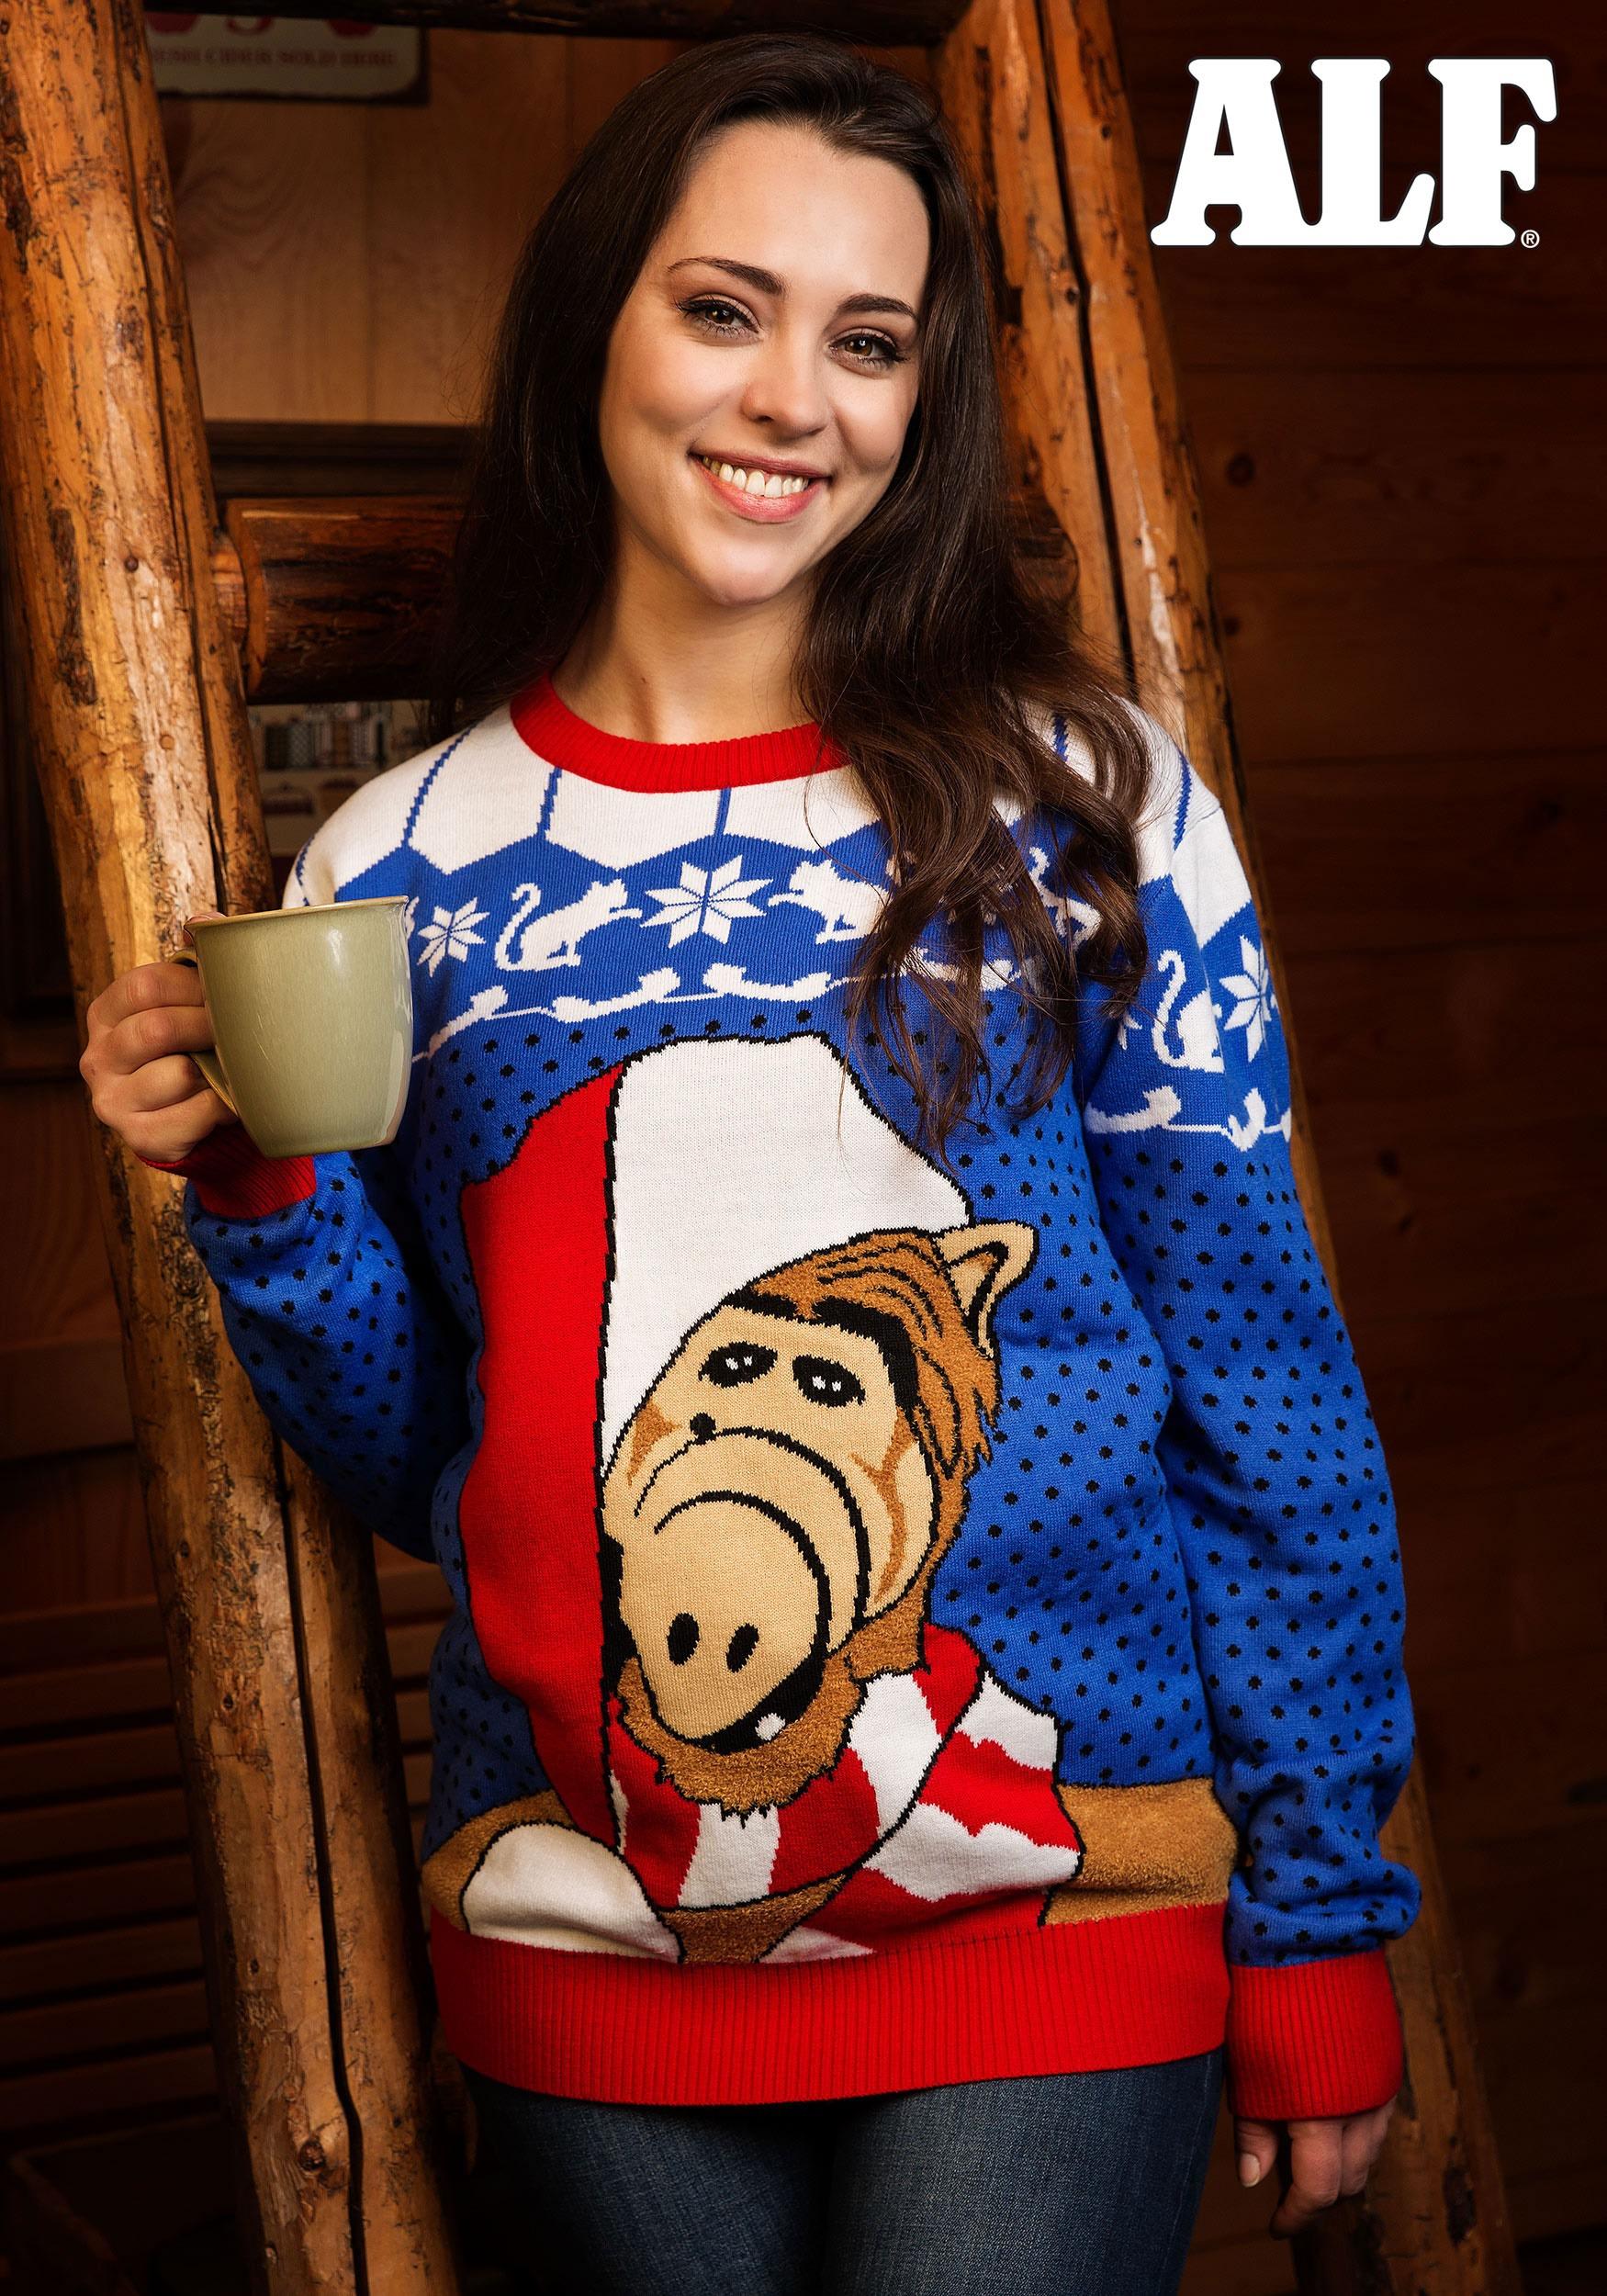 Alf Christmas Jumper